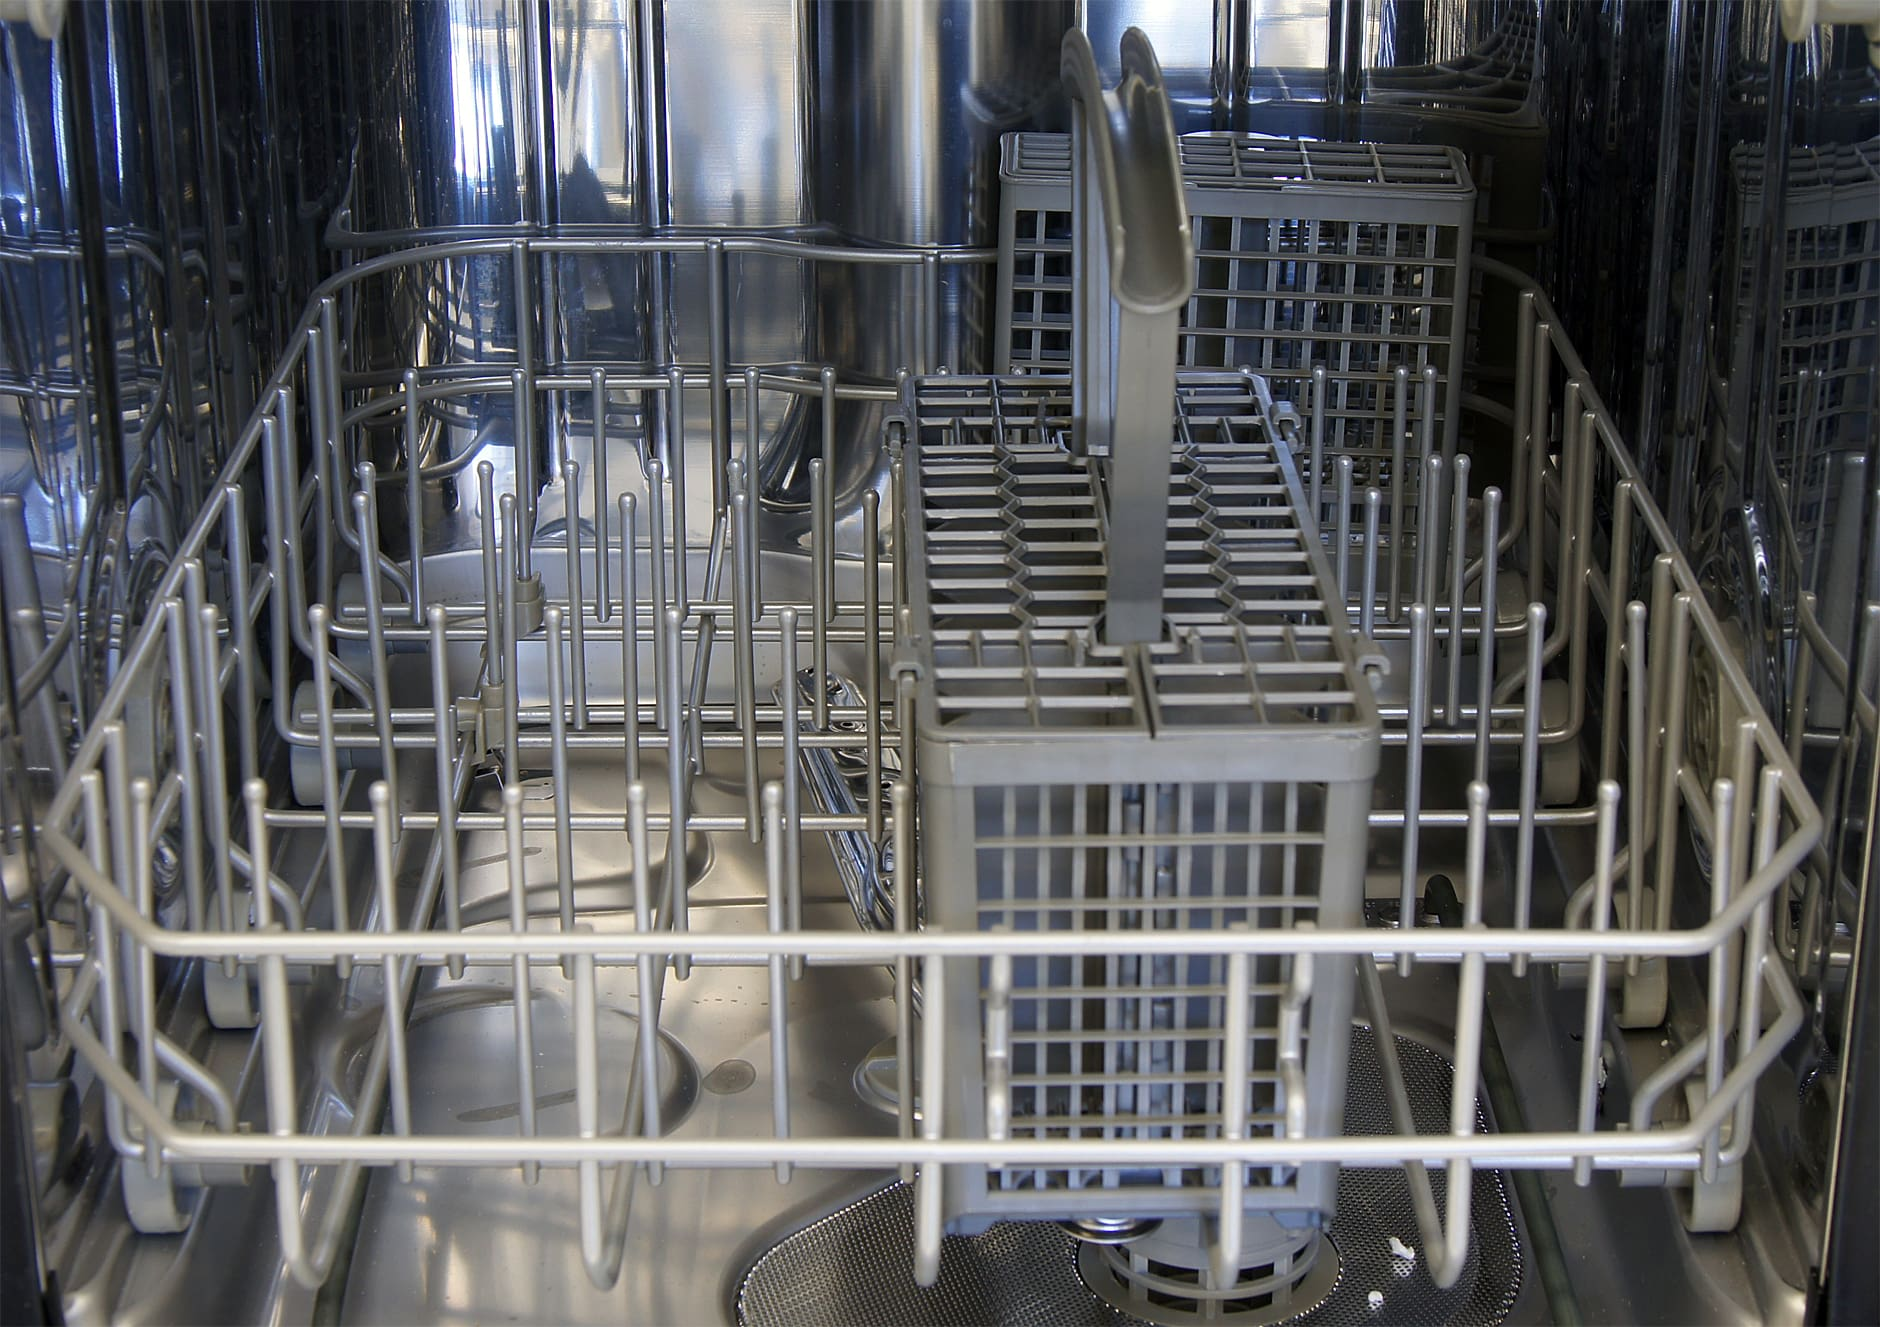 Kenmore Elite 14683 closeup of bottom rack